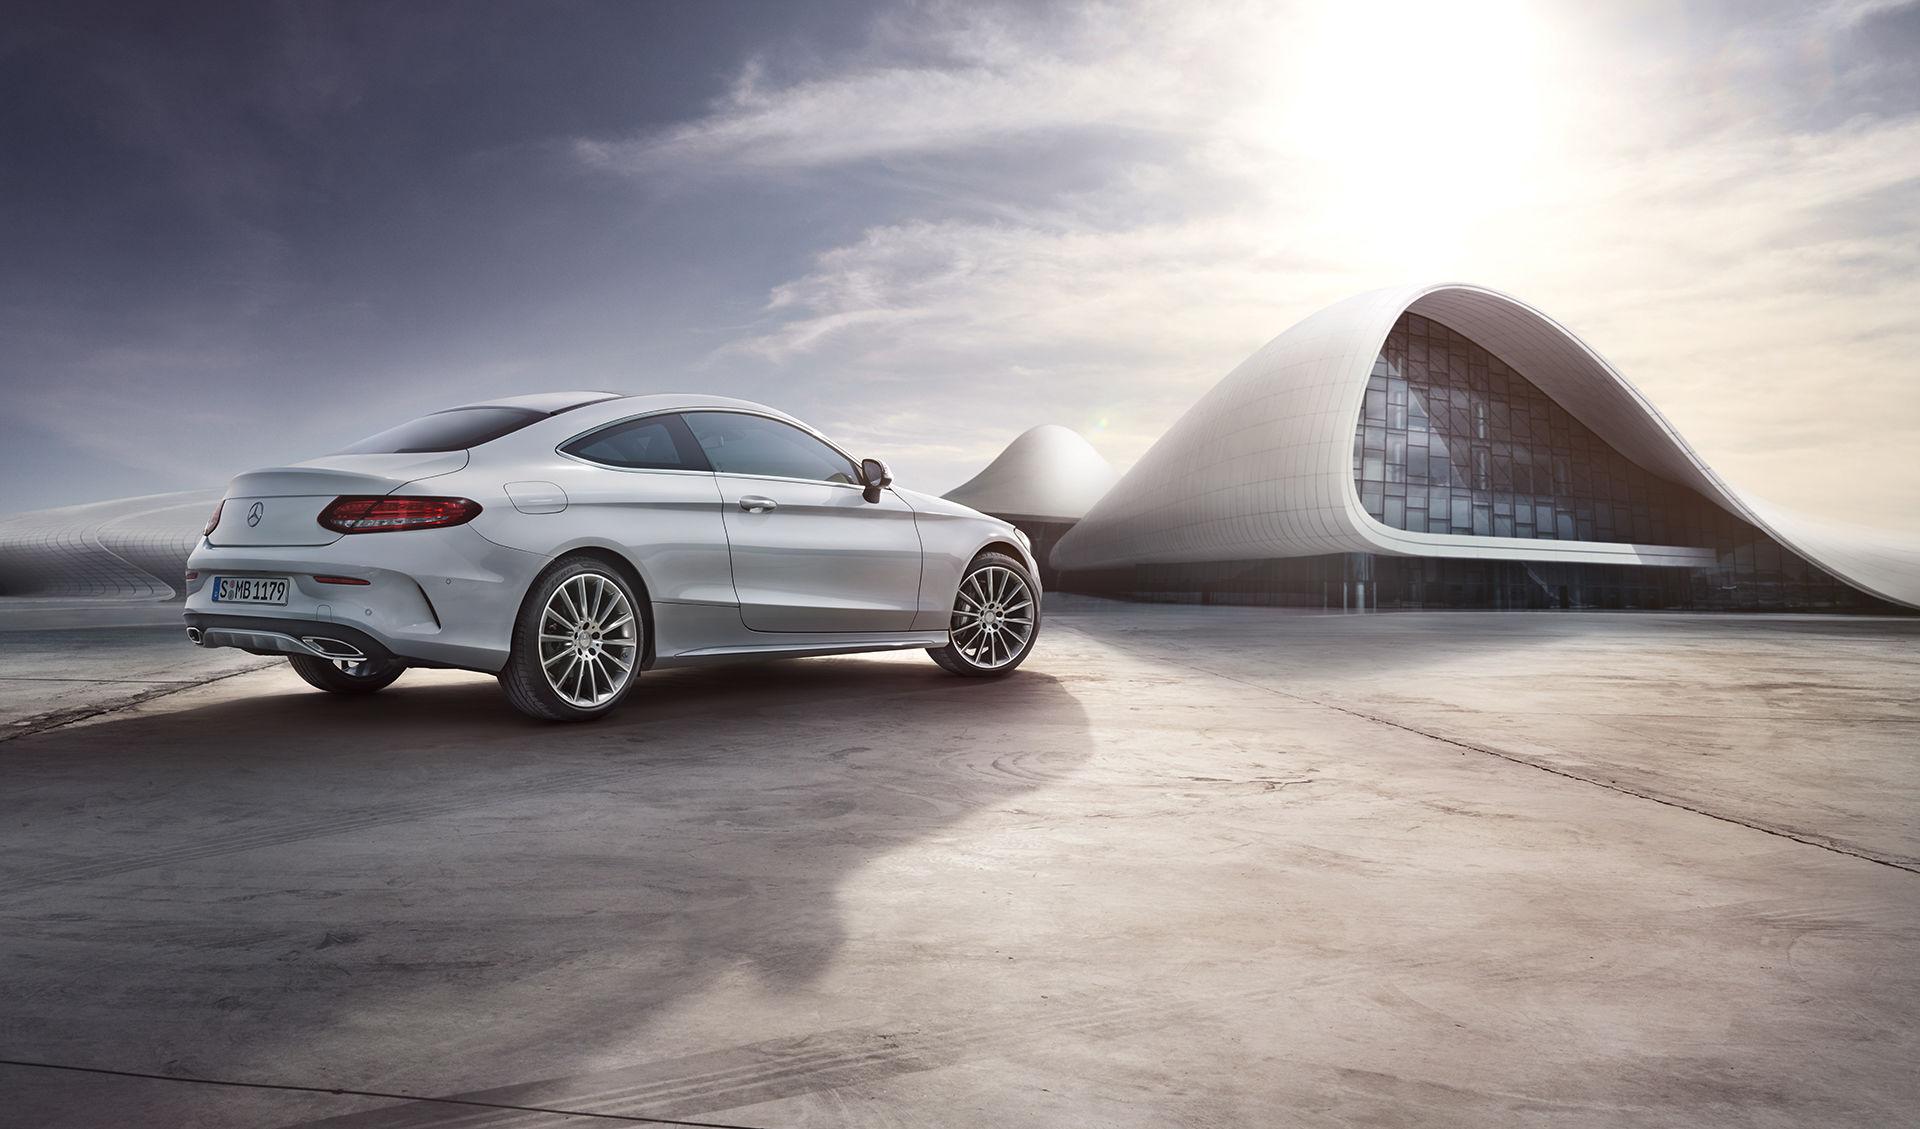 ANKE LUCKMANN for Daimler China